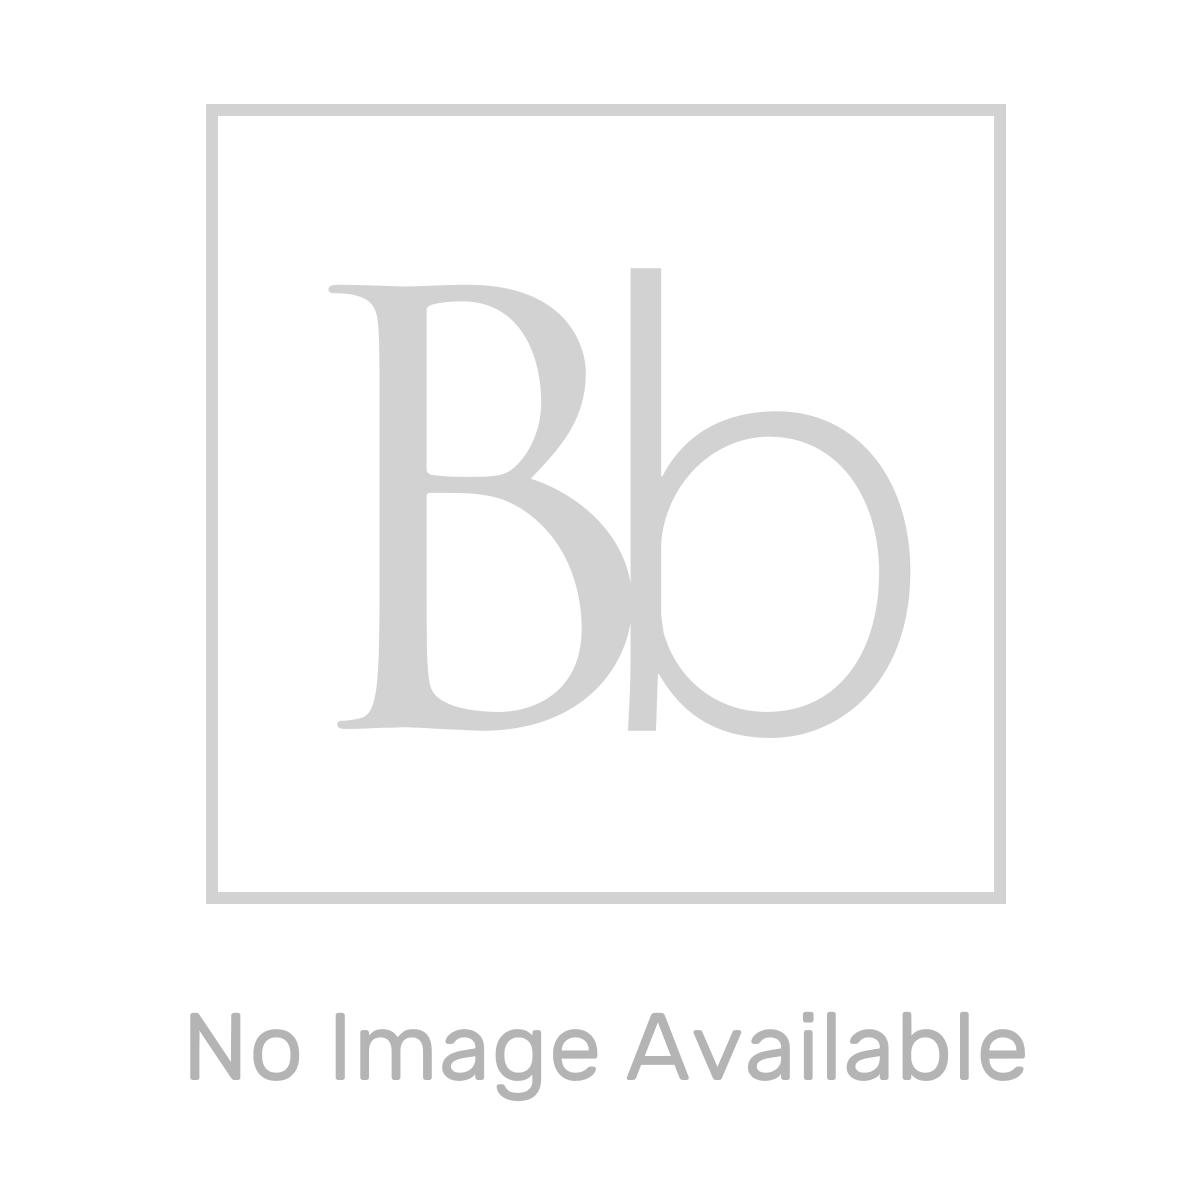 HiB Warm White LED Round Chrome Shower Light